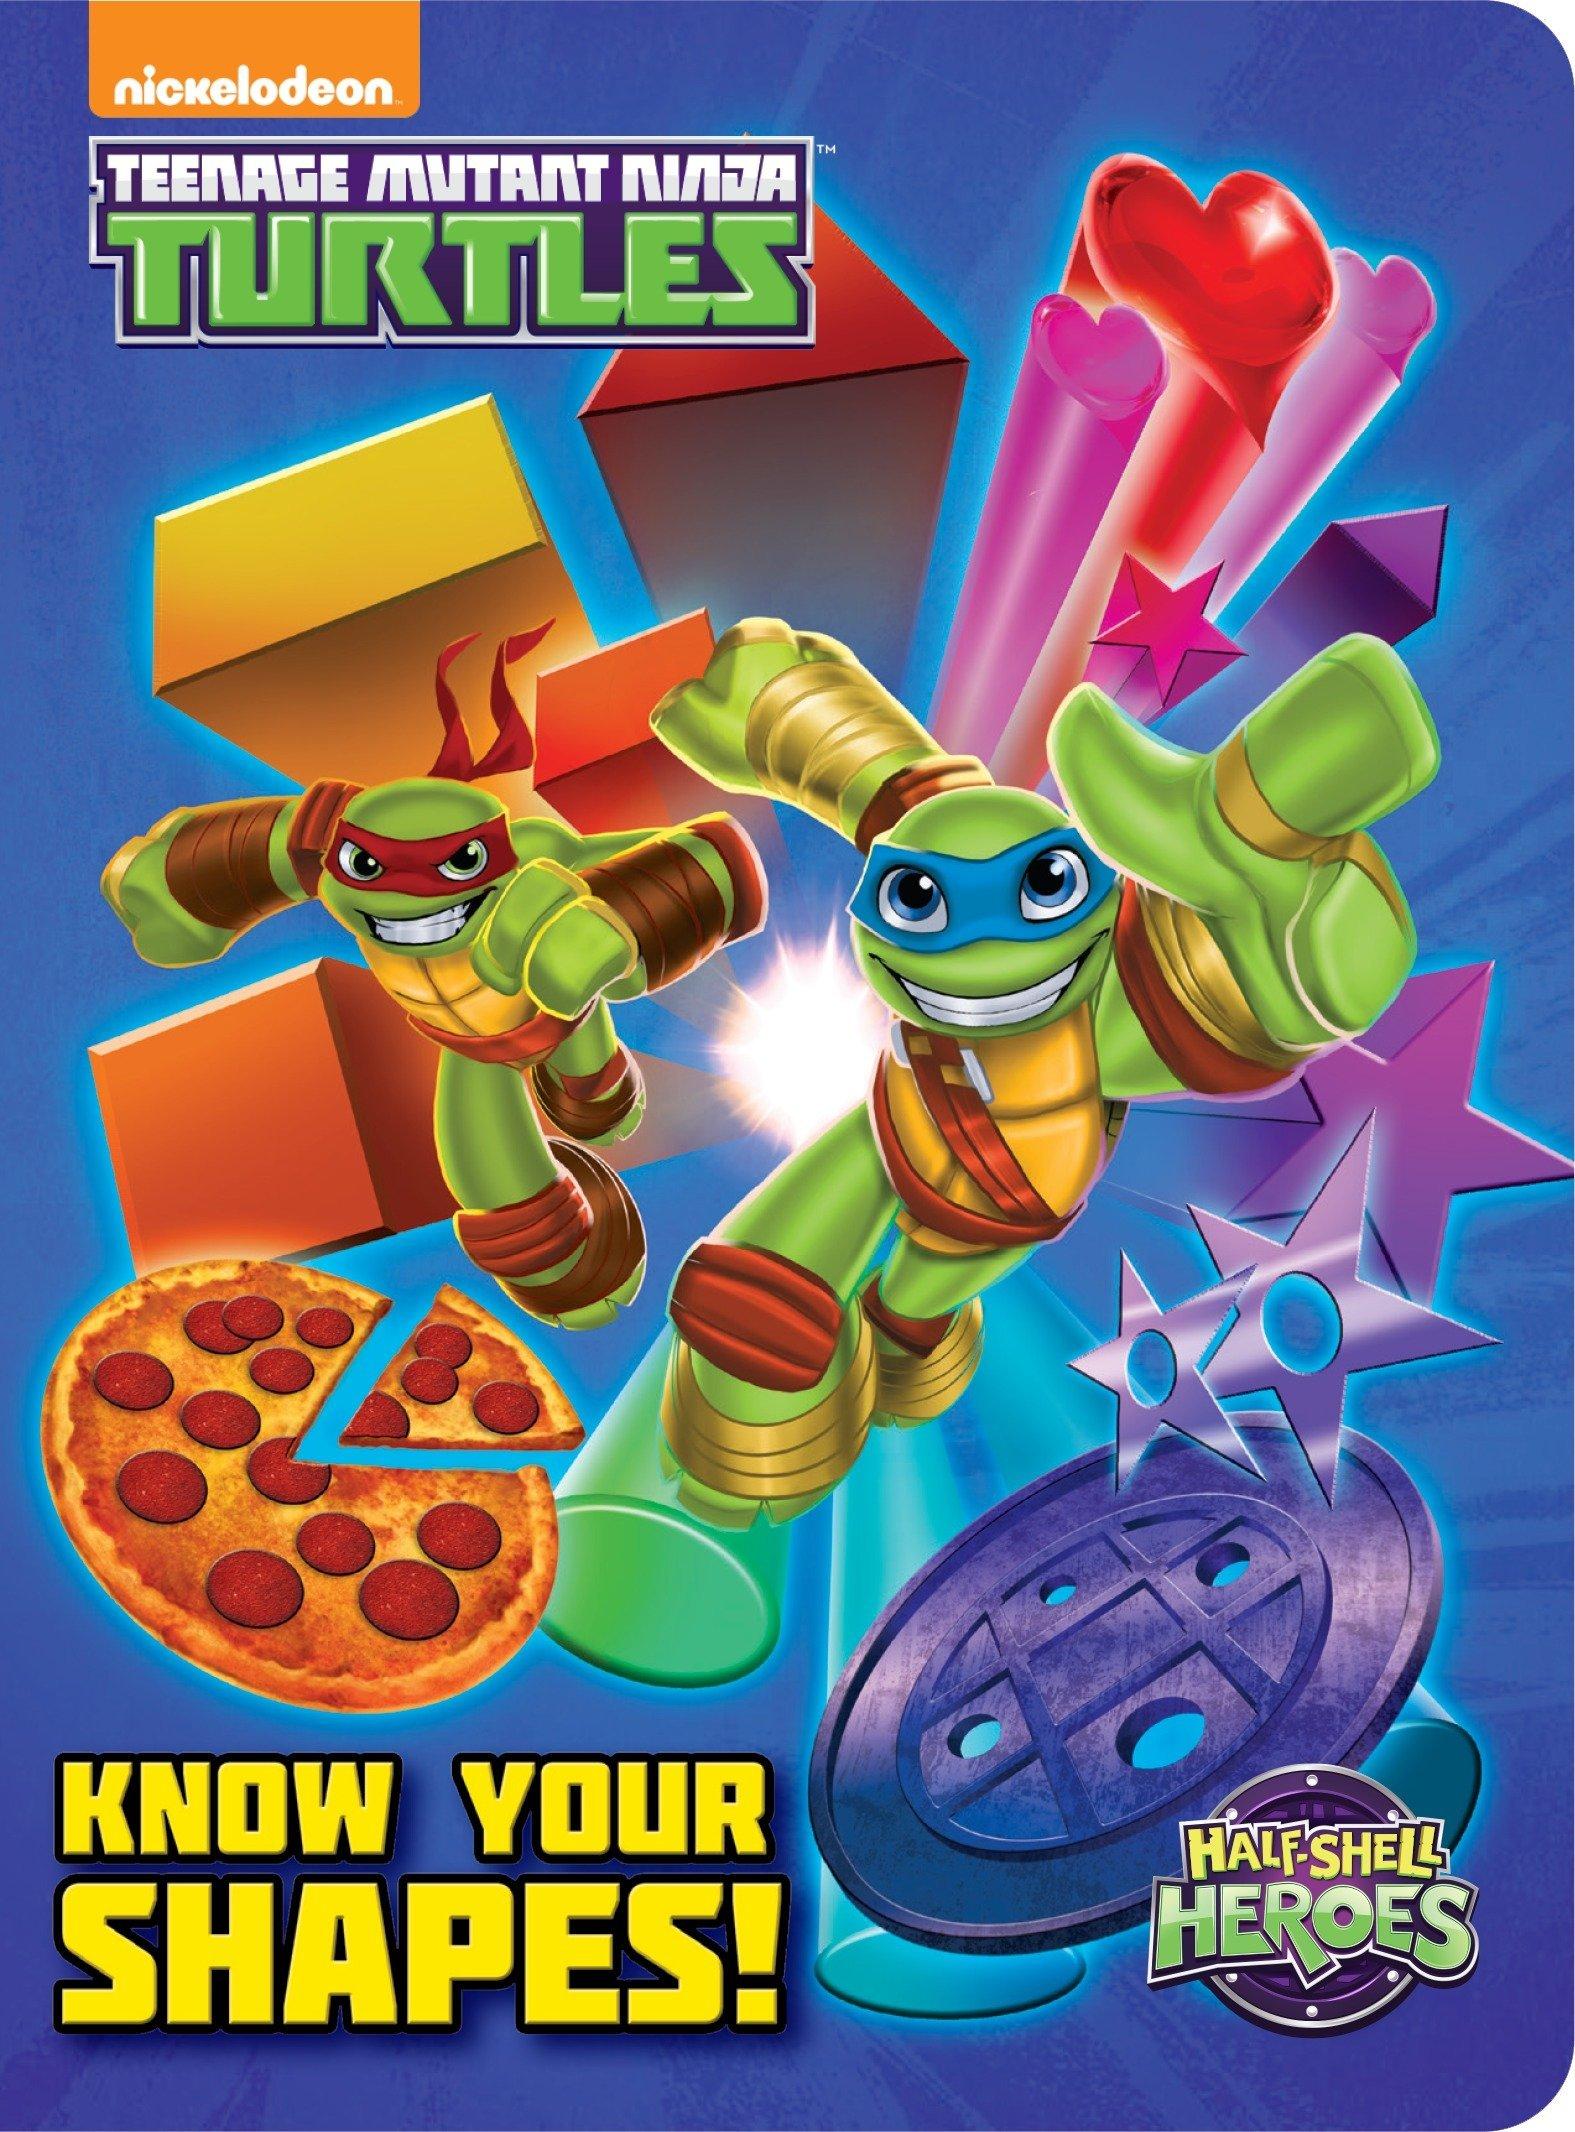 Amazon.com: Know Your Shapes! (Teenage Mutant Ninja Turtles ...